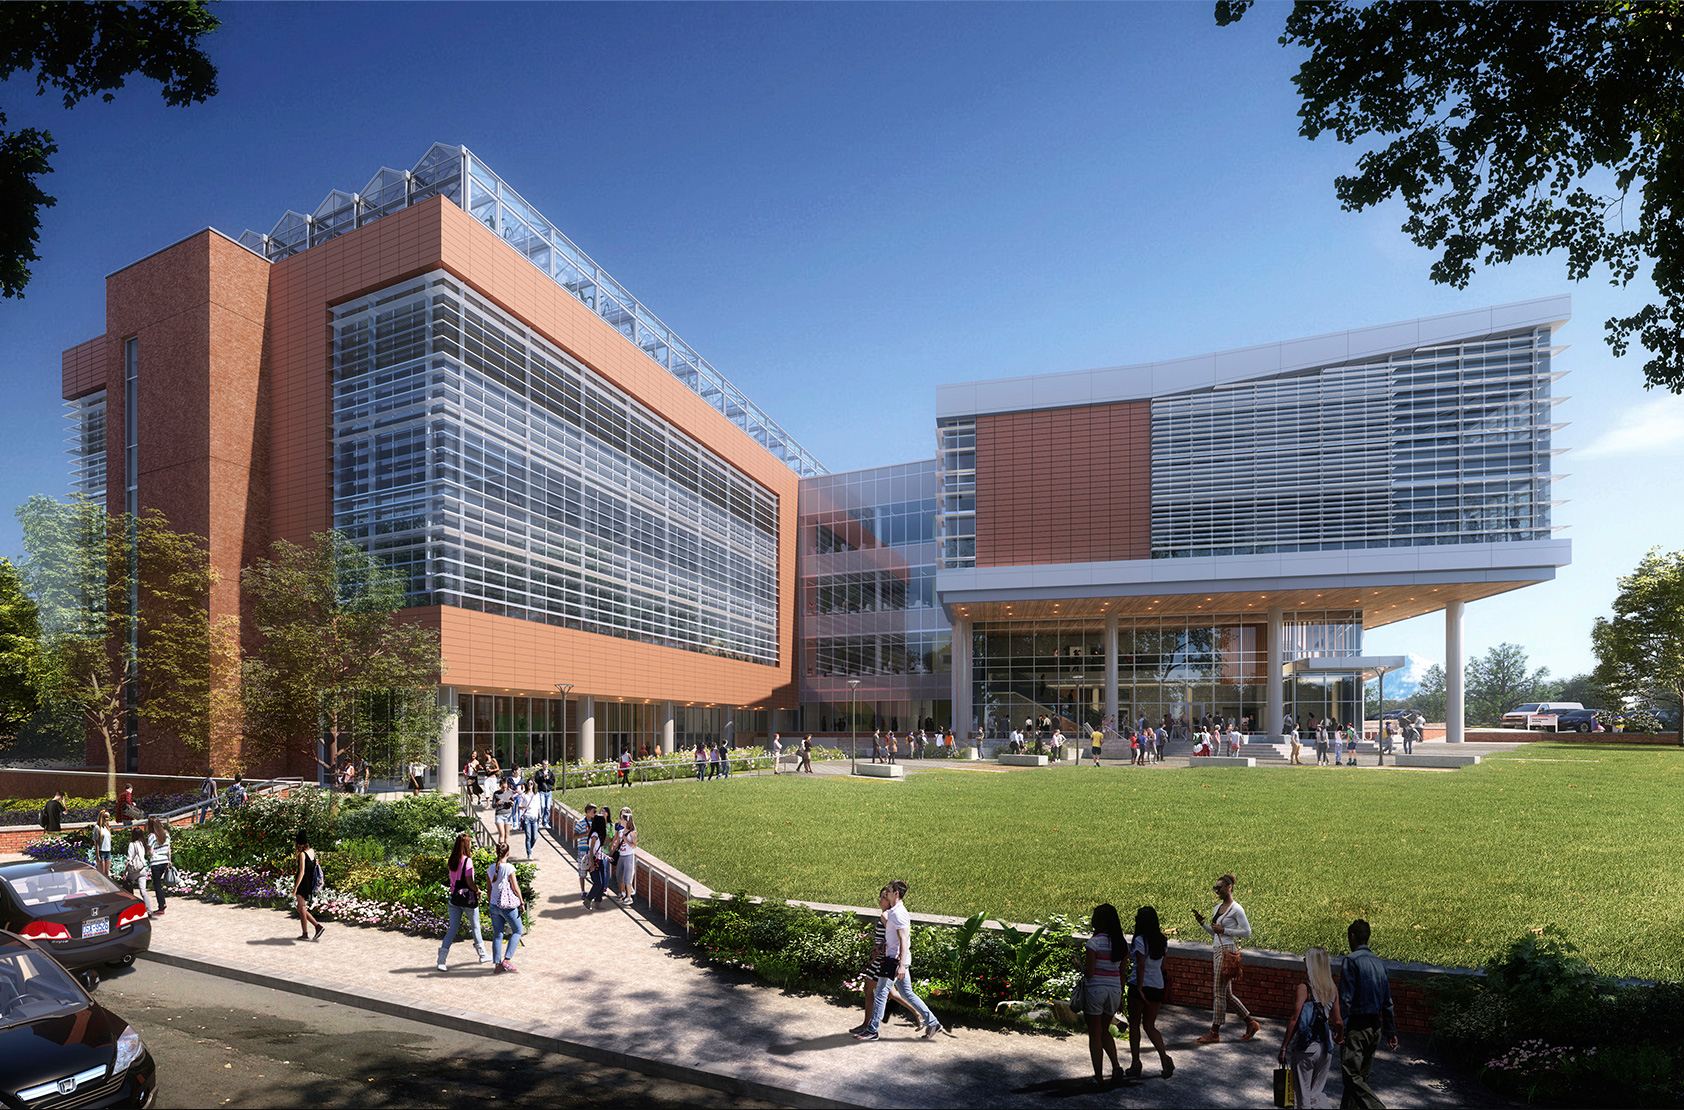 North Carolina State University - Plant Sciences Building